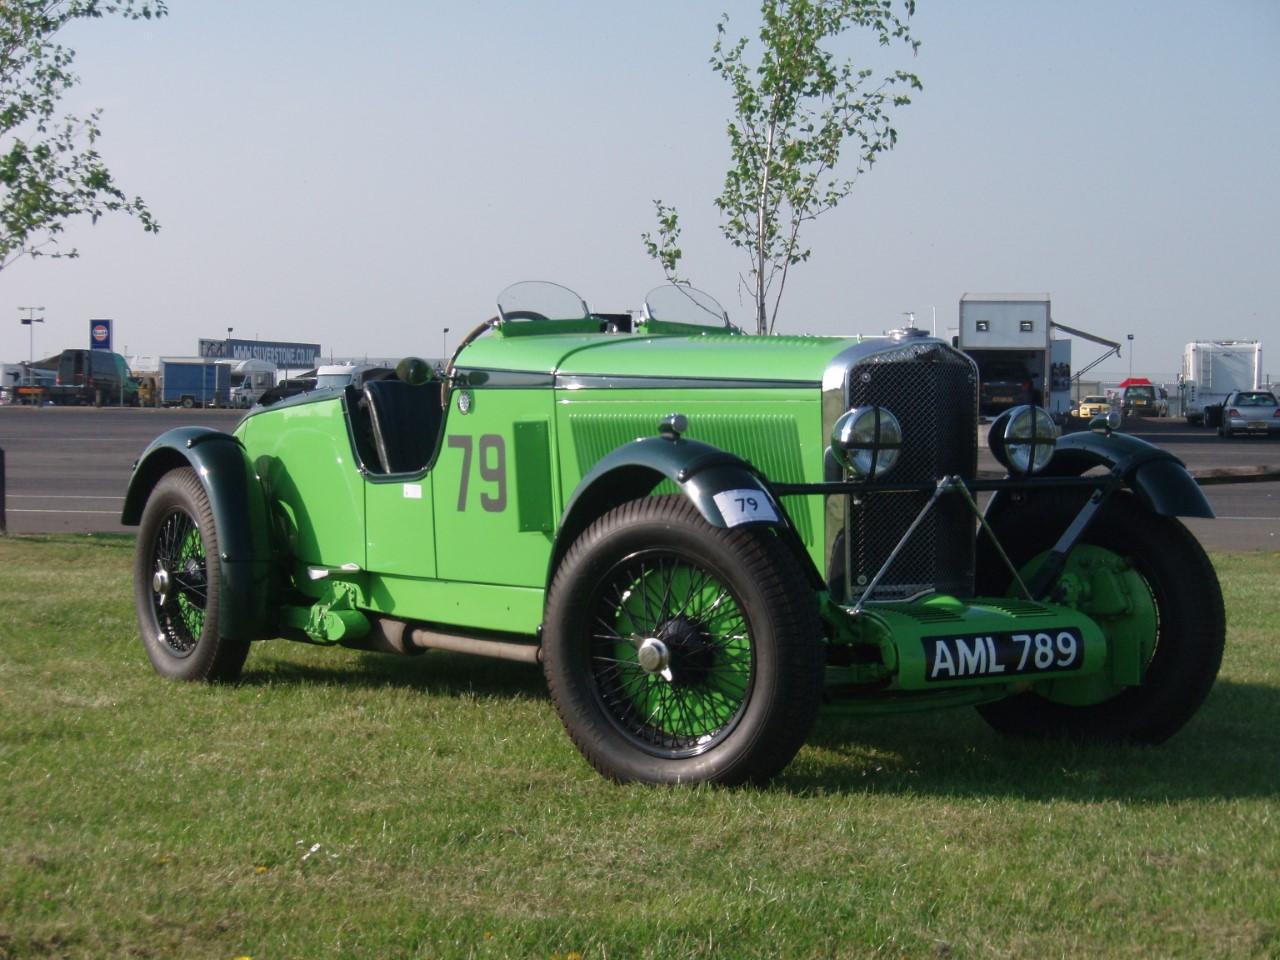 AML789